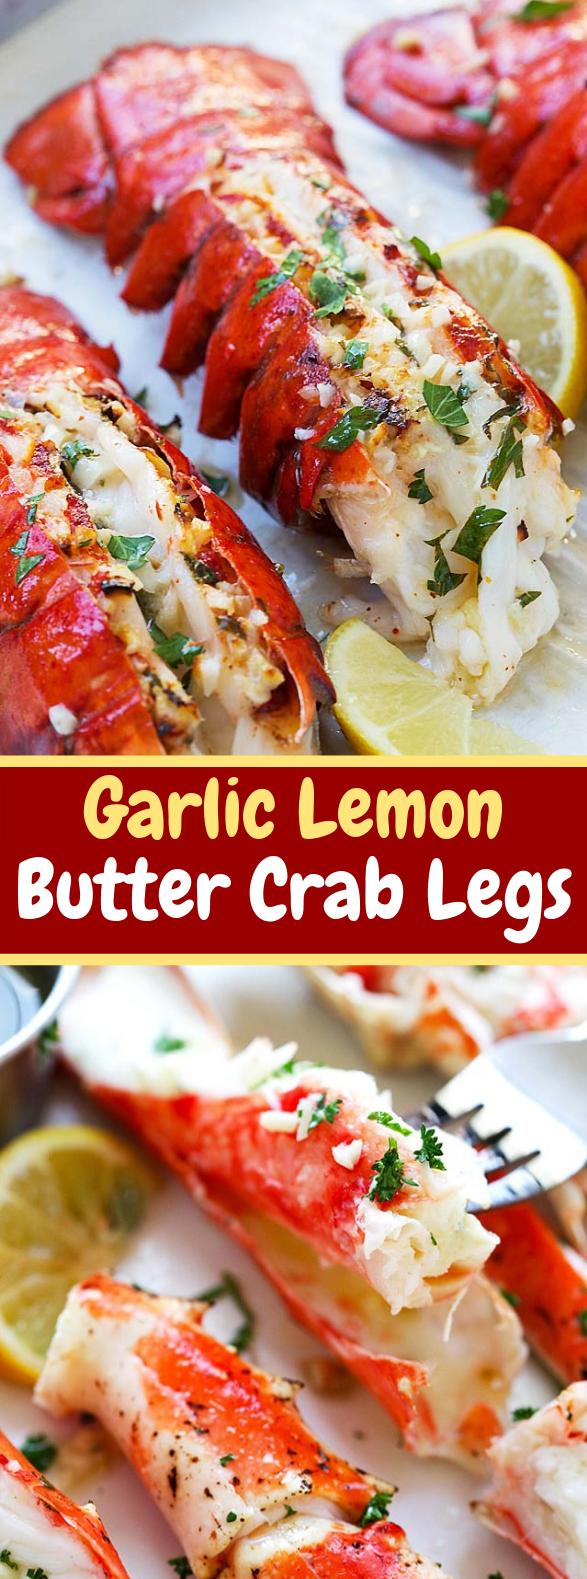 Garlic Lemon Butter Crab Legs #dinner #americanrecipe